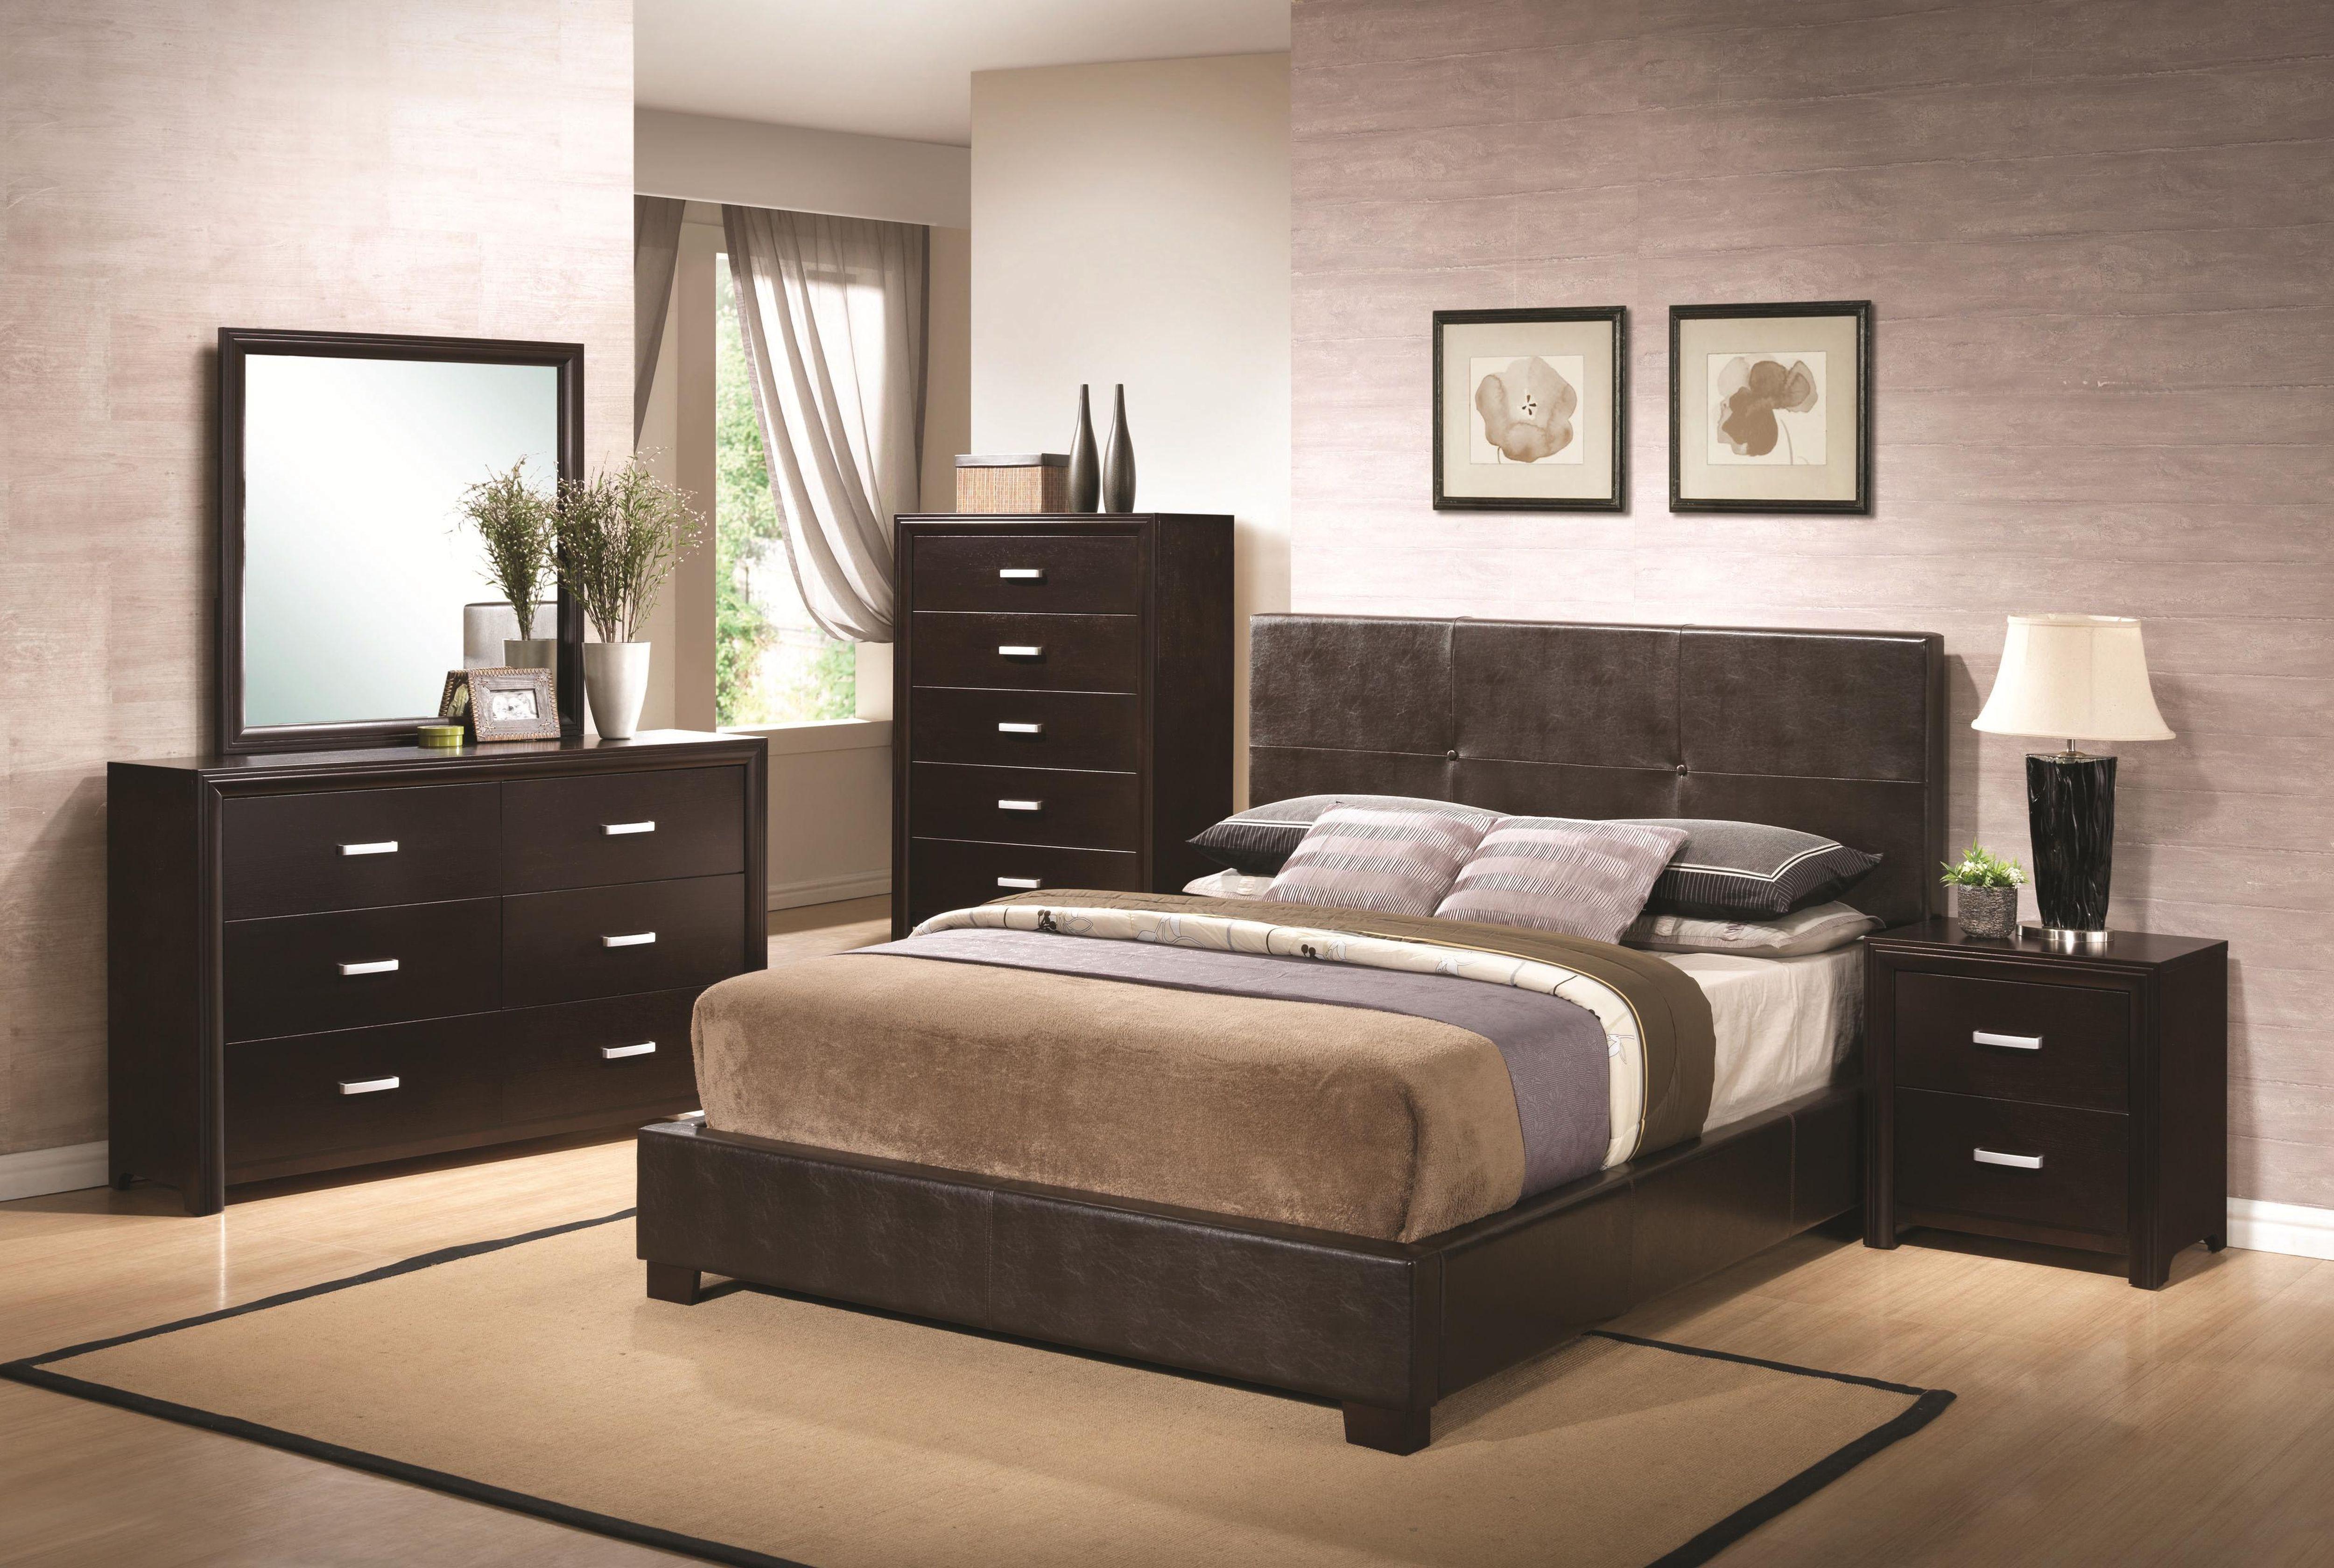 black brown bedroom furniture photo - 9